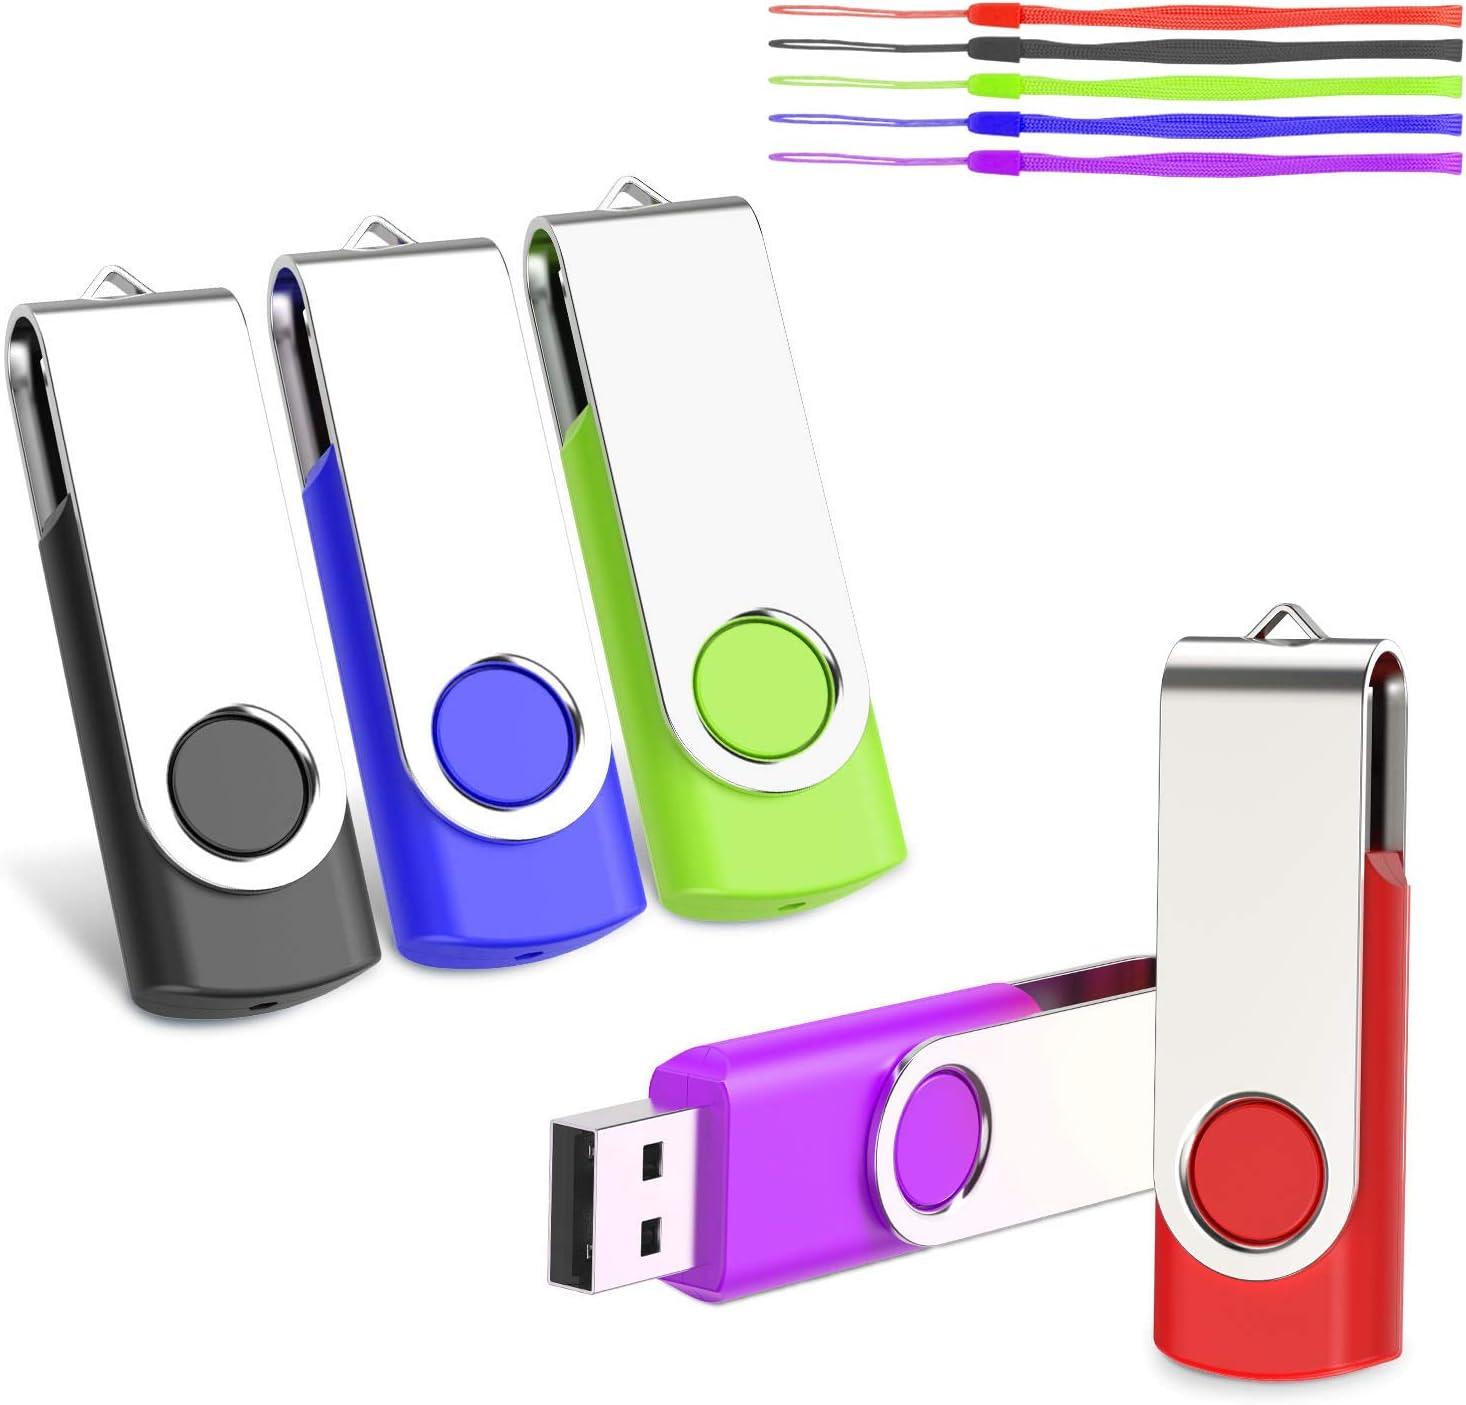 Usb Stick Kacai 32gb 5 Stück Speichersticks Usb Sticks Elektronik